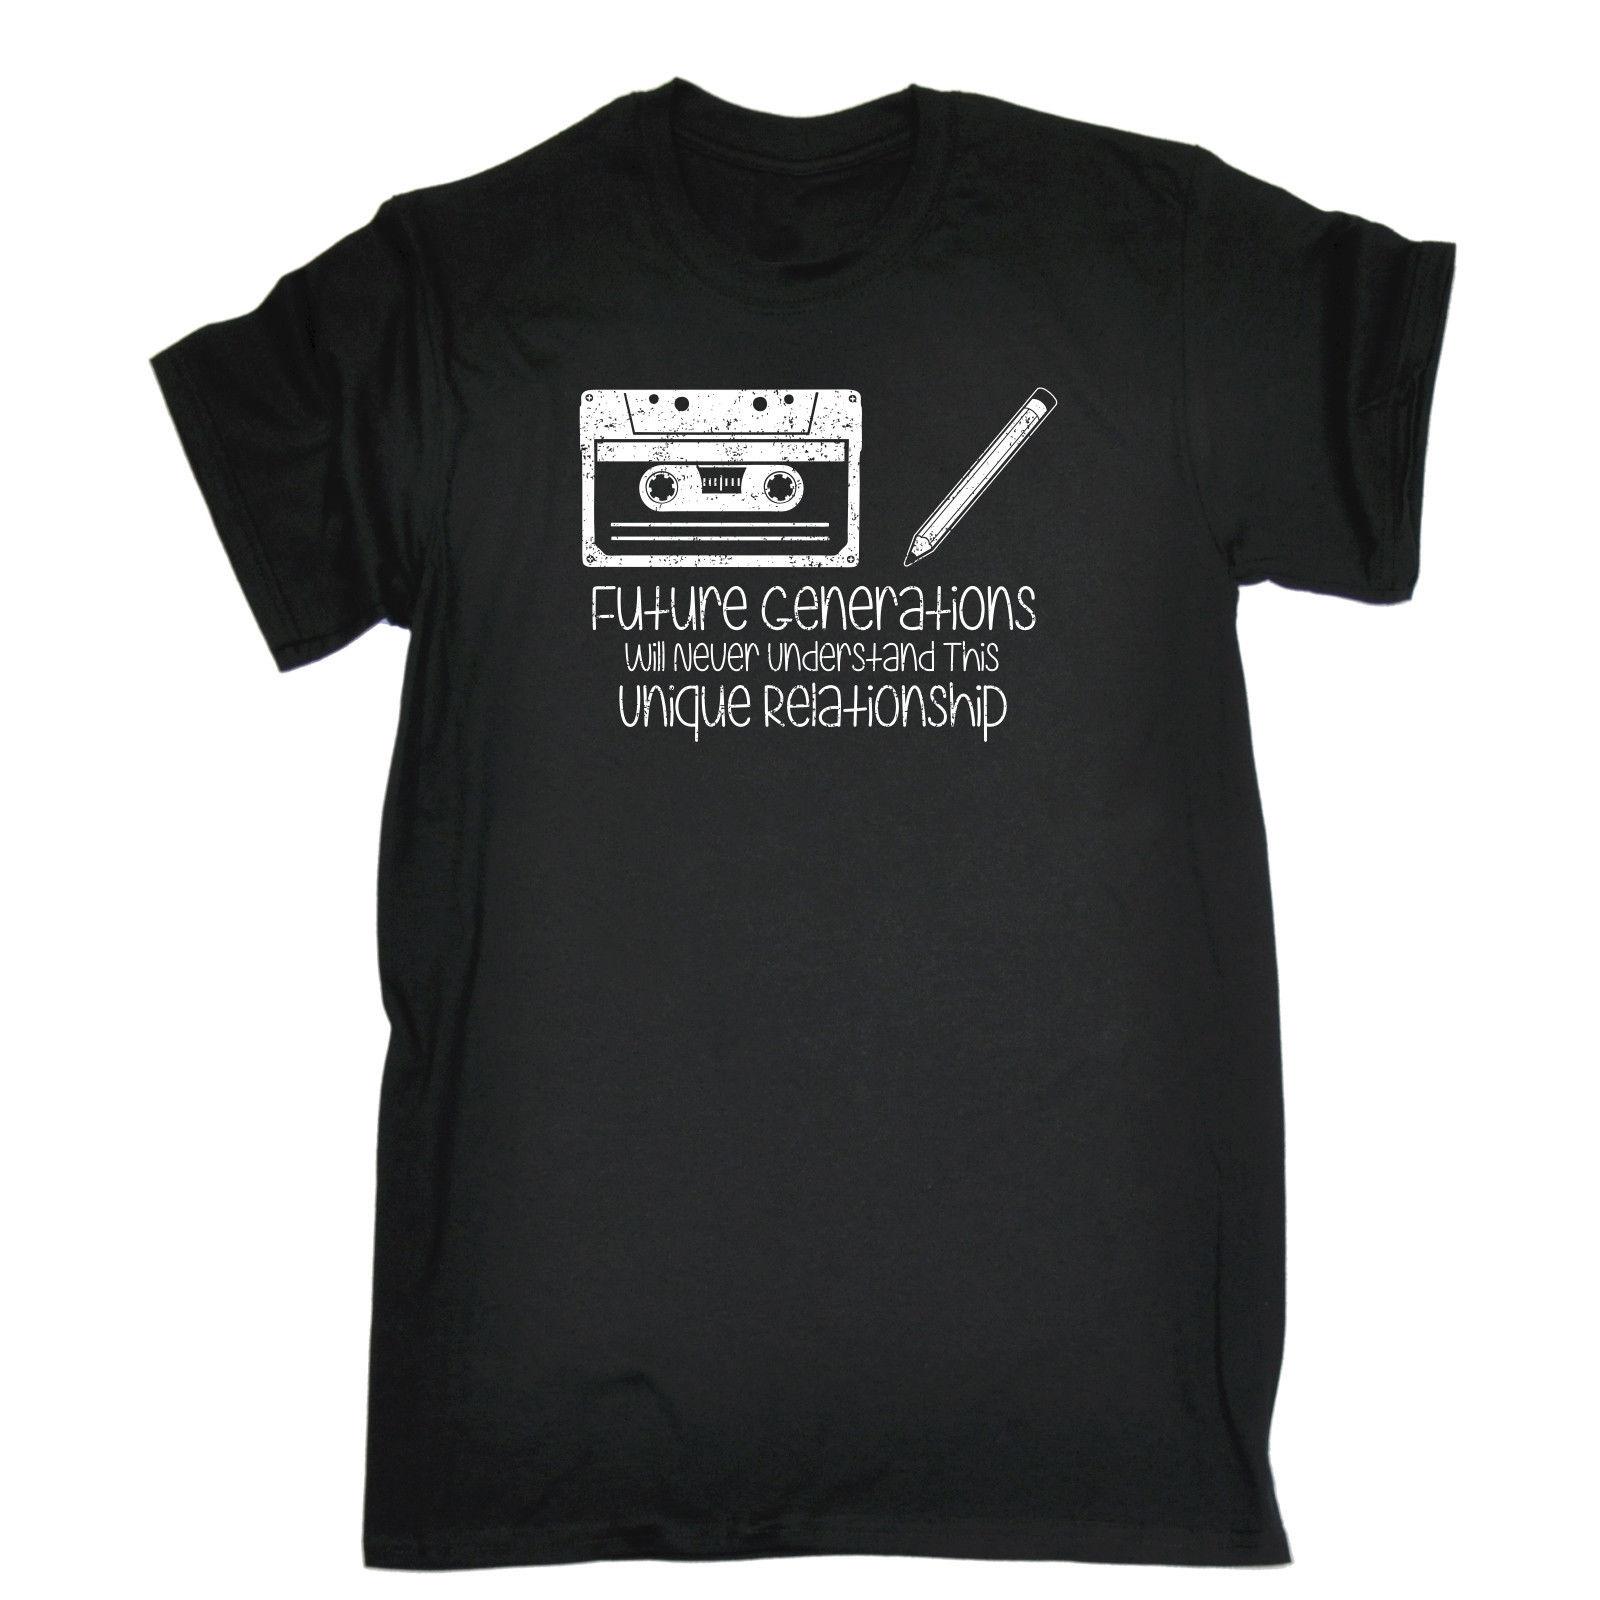 FUTURE GENERATIONS WILL NEVER UNDERSTAND T Shirt Tee Vinyl Funny